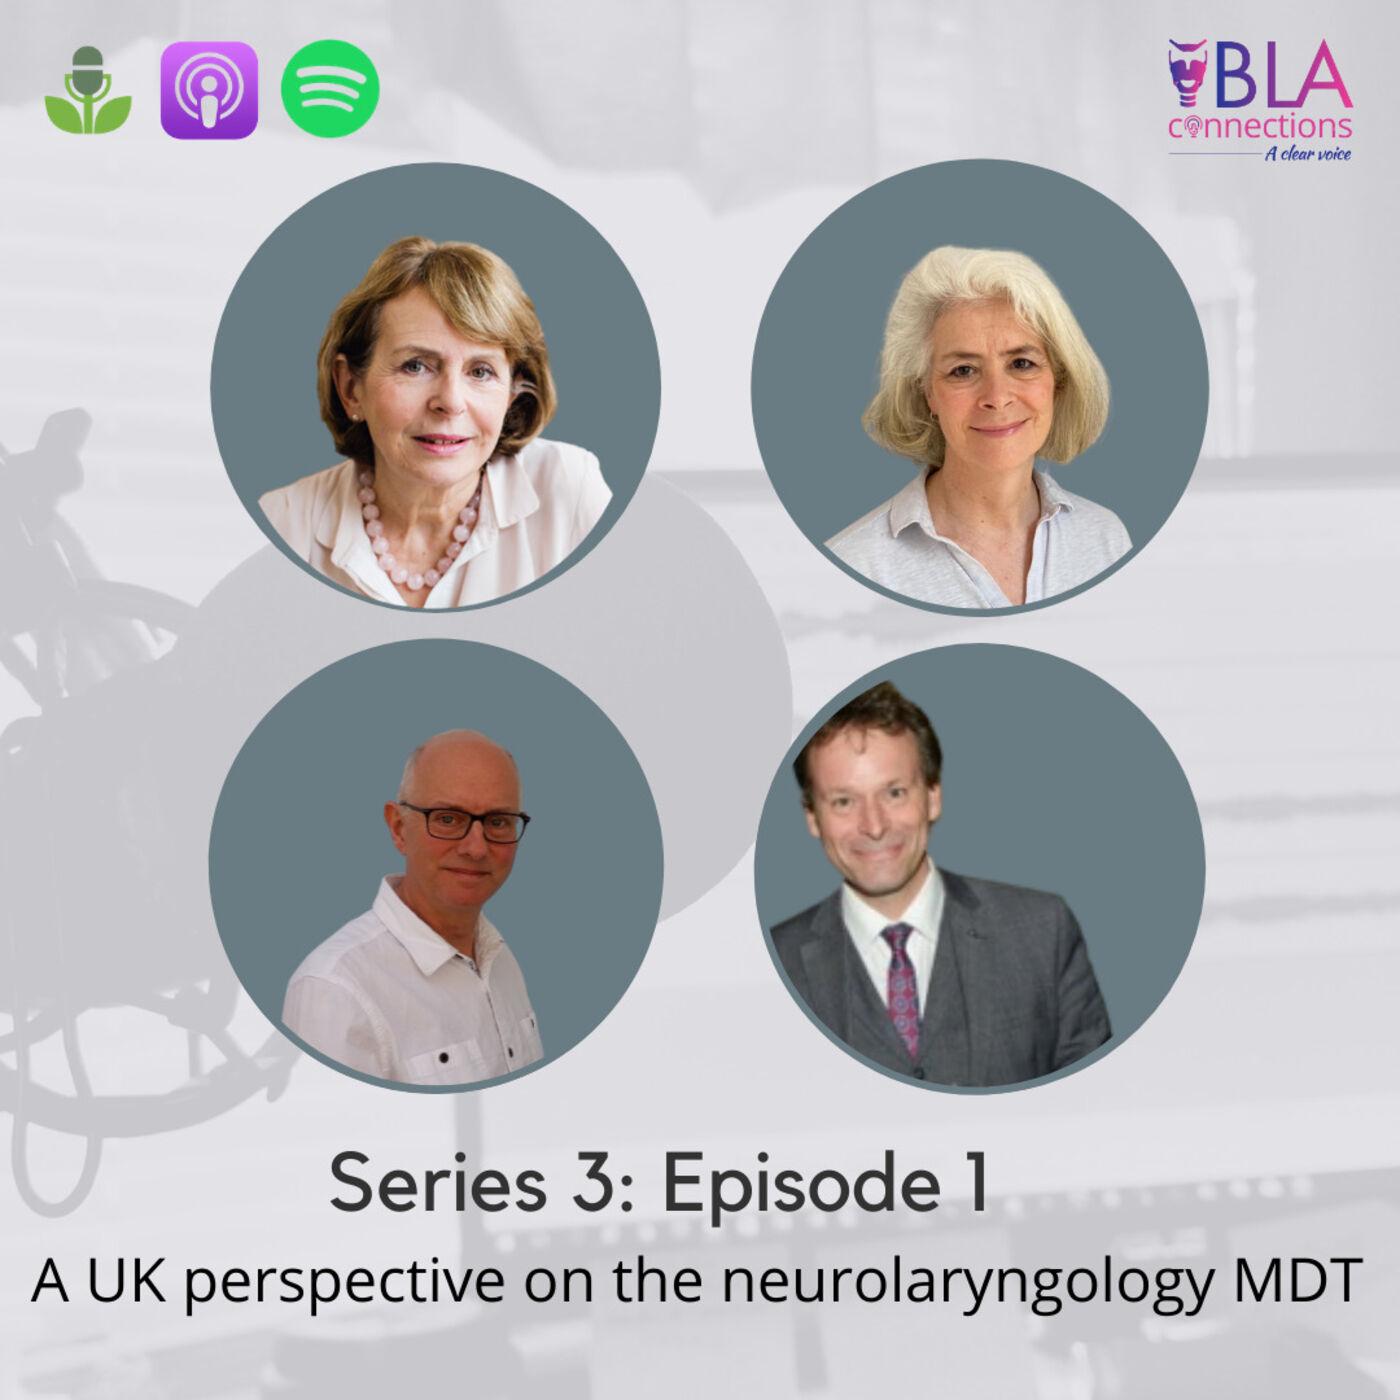 S3 Ep 1: A UK perspective on the neurolaryngology MDT